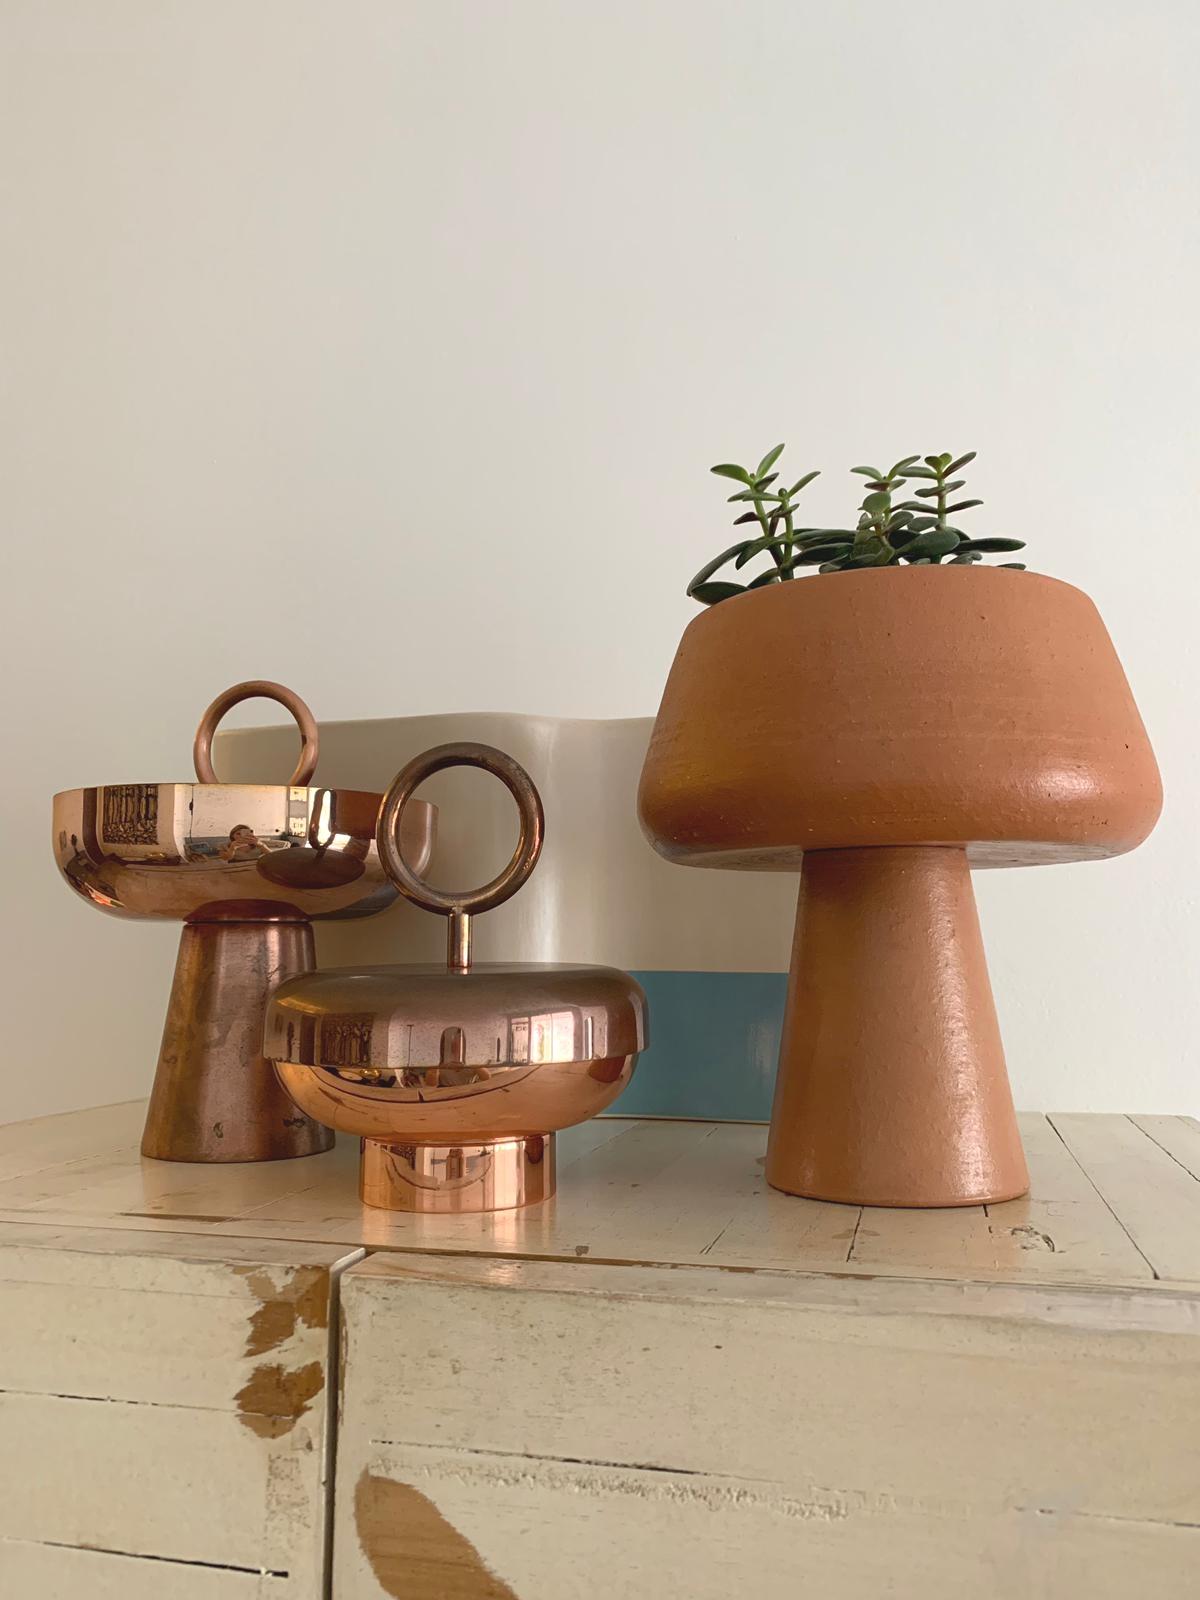 Stacks and Conterraneos / Jahara studio, various decorative objects